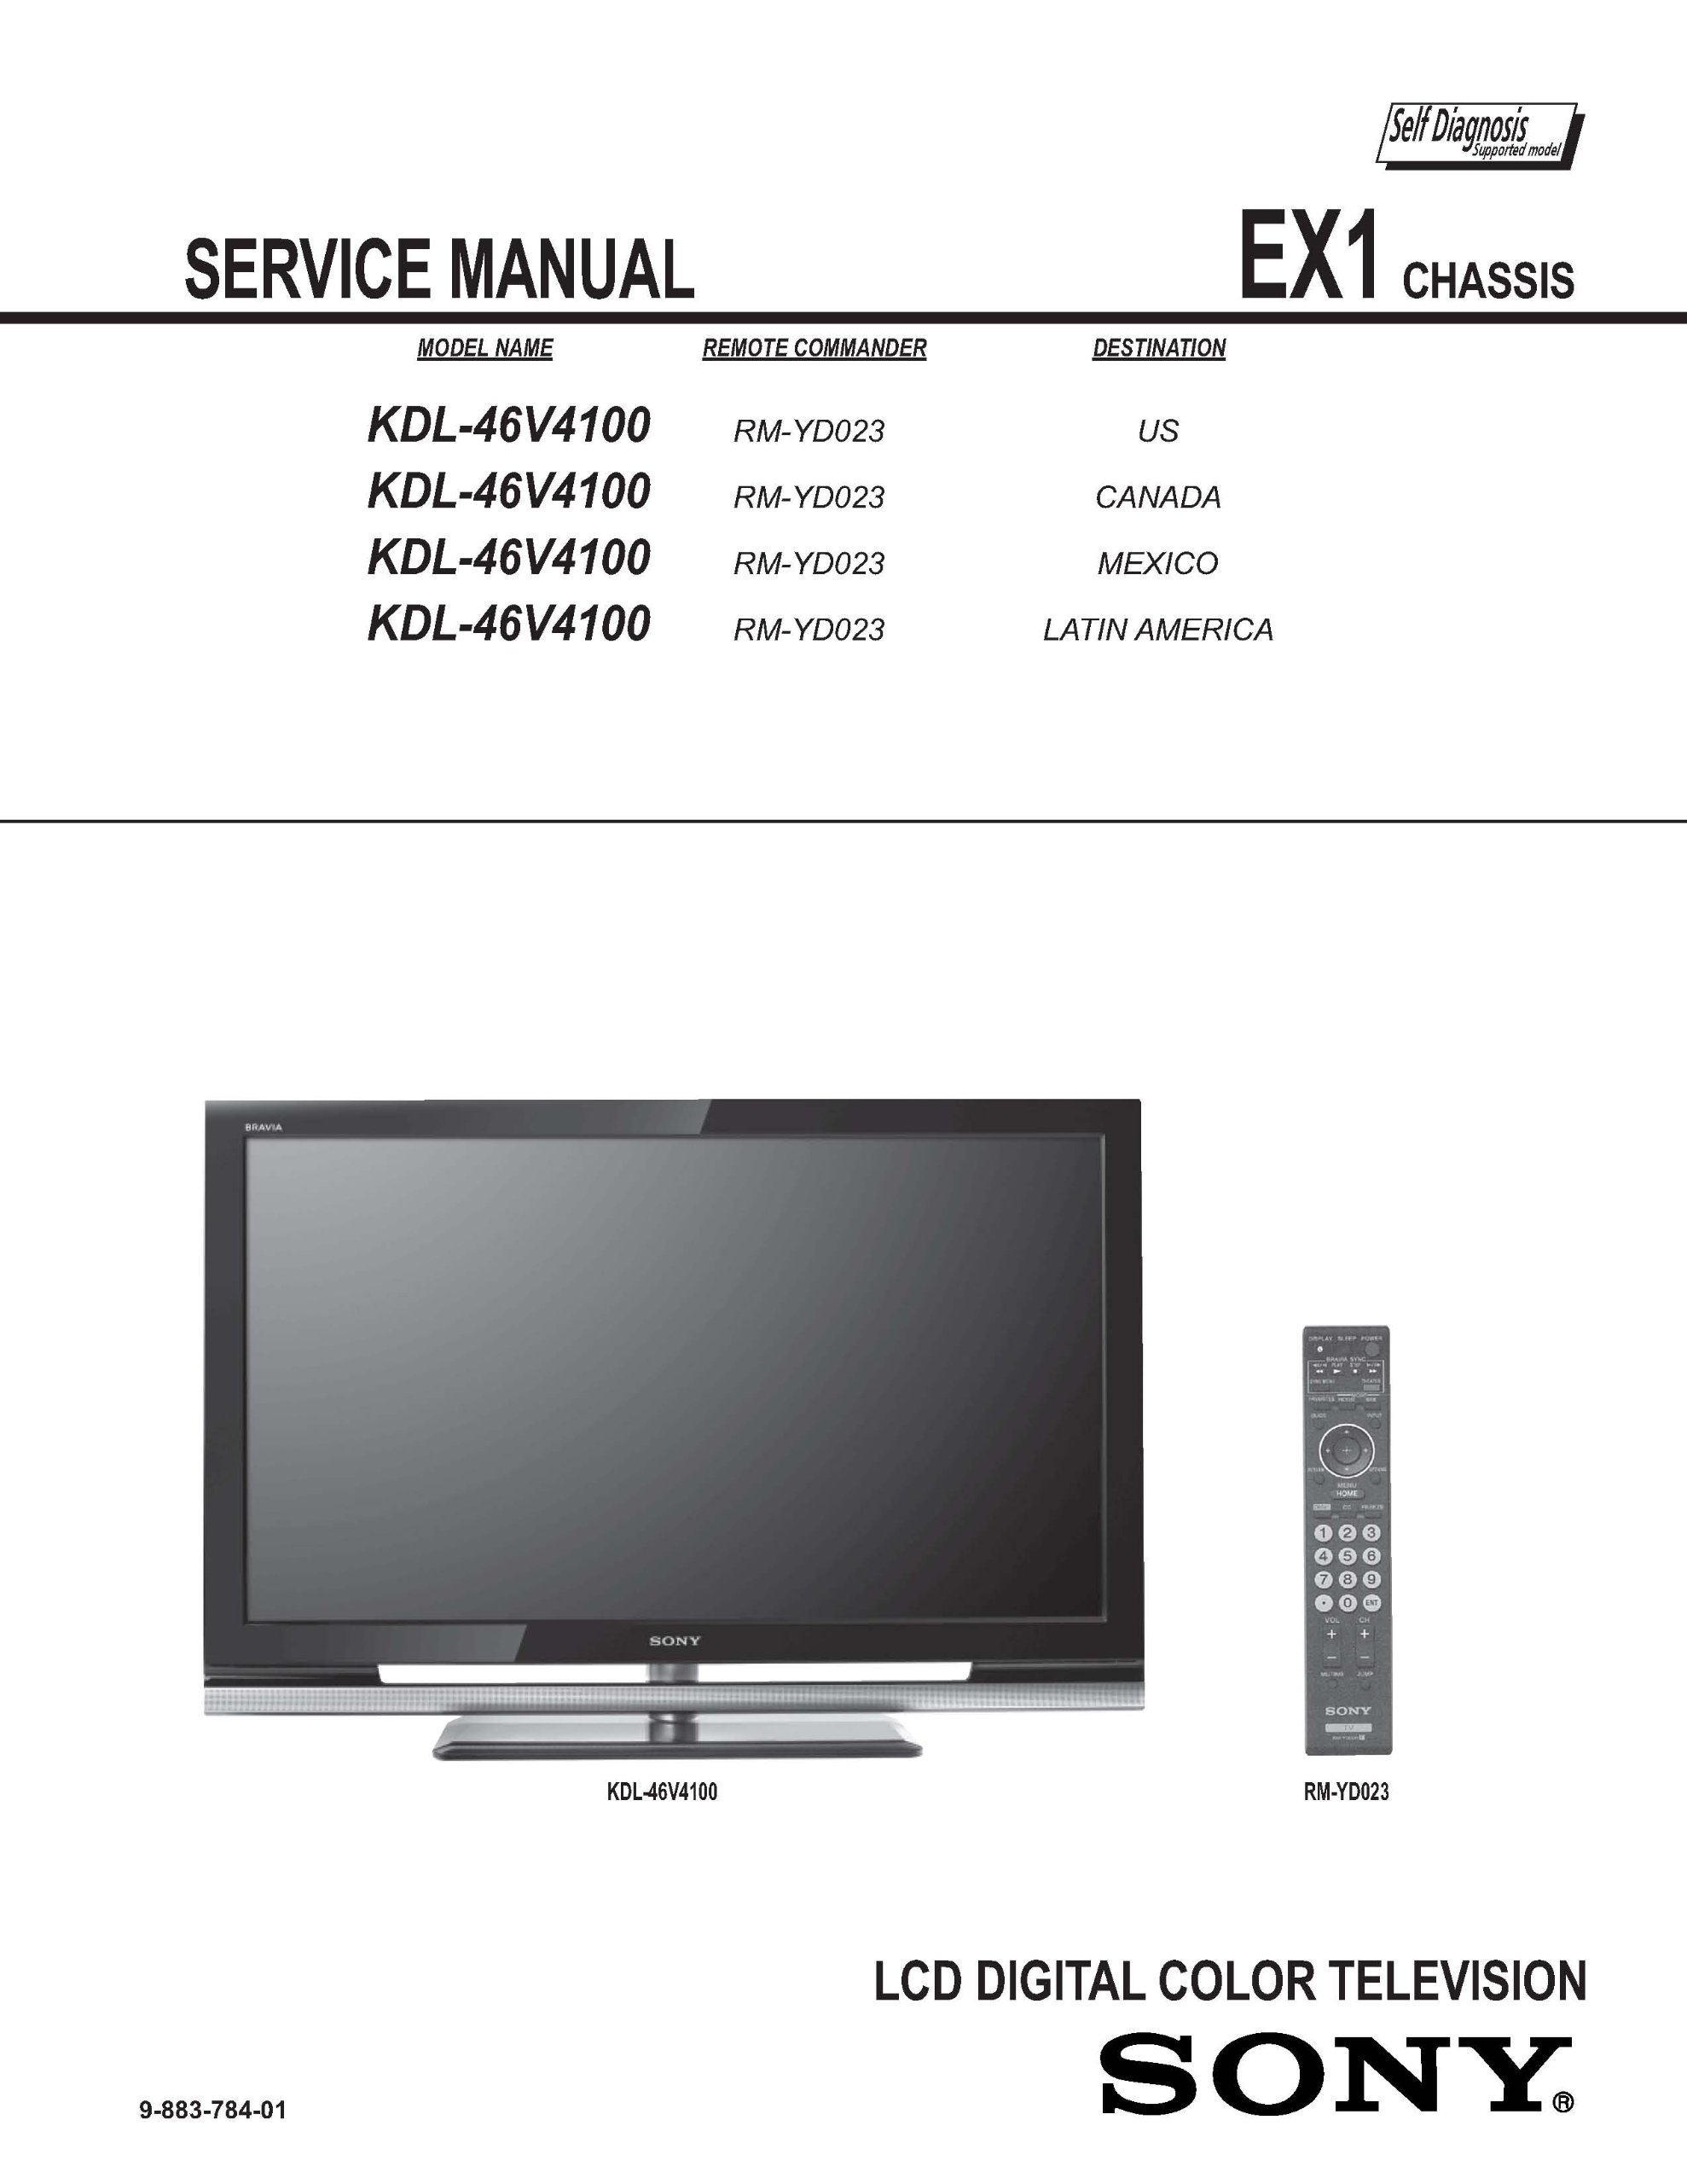 sony kdl46v4100 kdl 46v4100 service manual sony amazon com books rh amazon com Sony LCD TV Sony KDL 46V4100 Manual